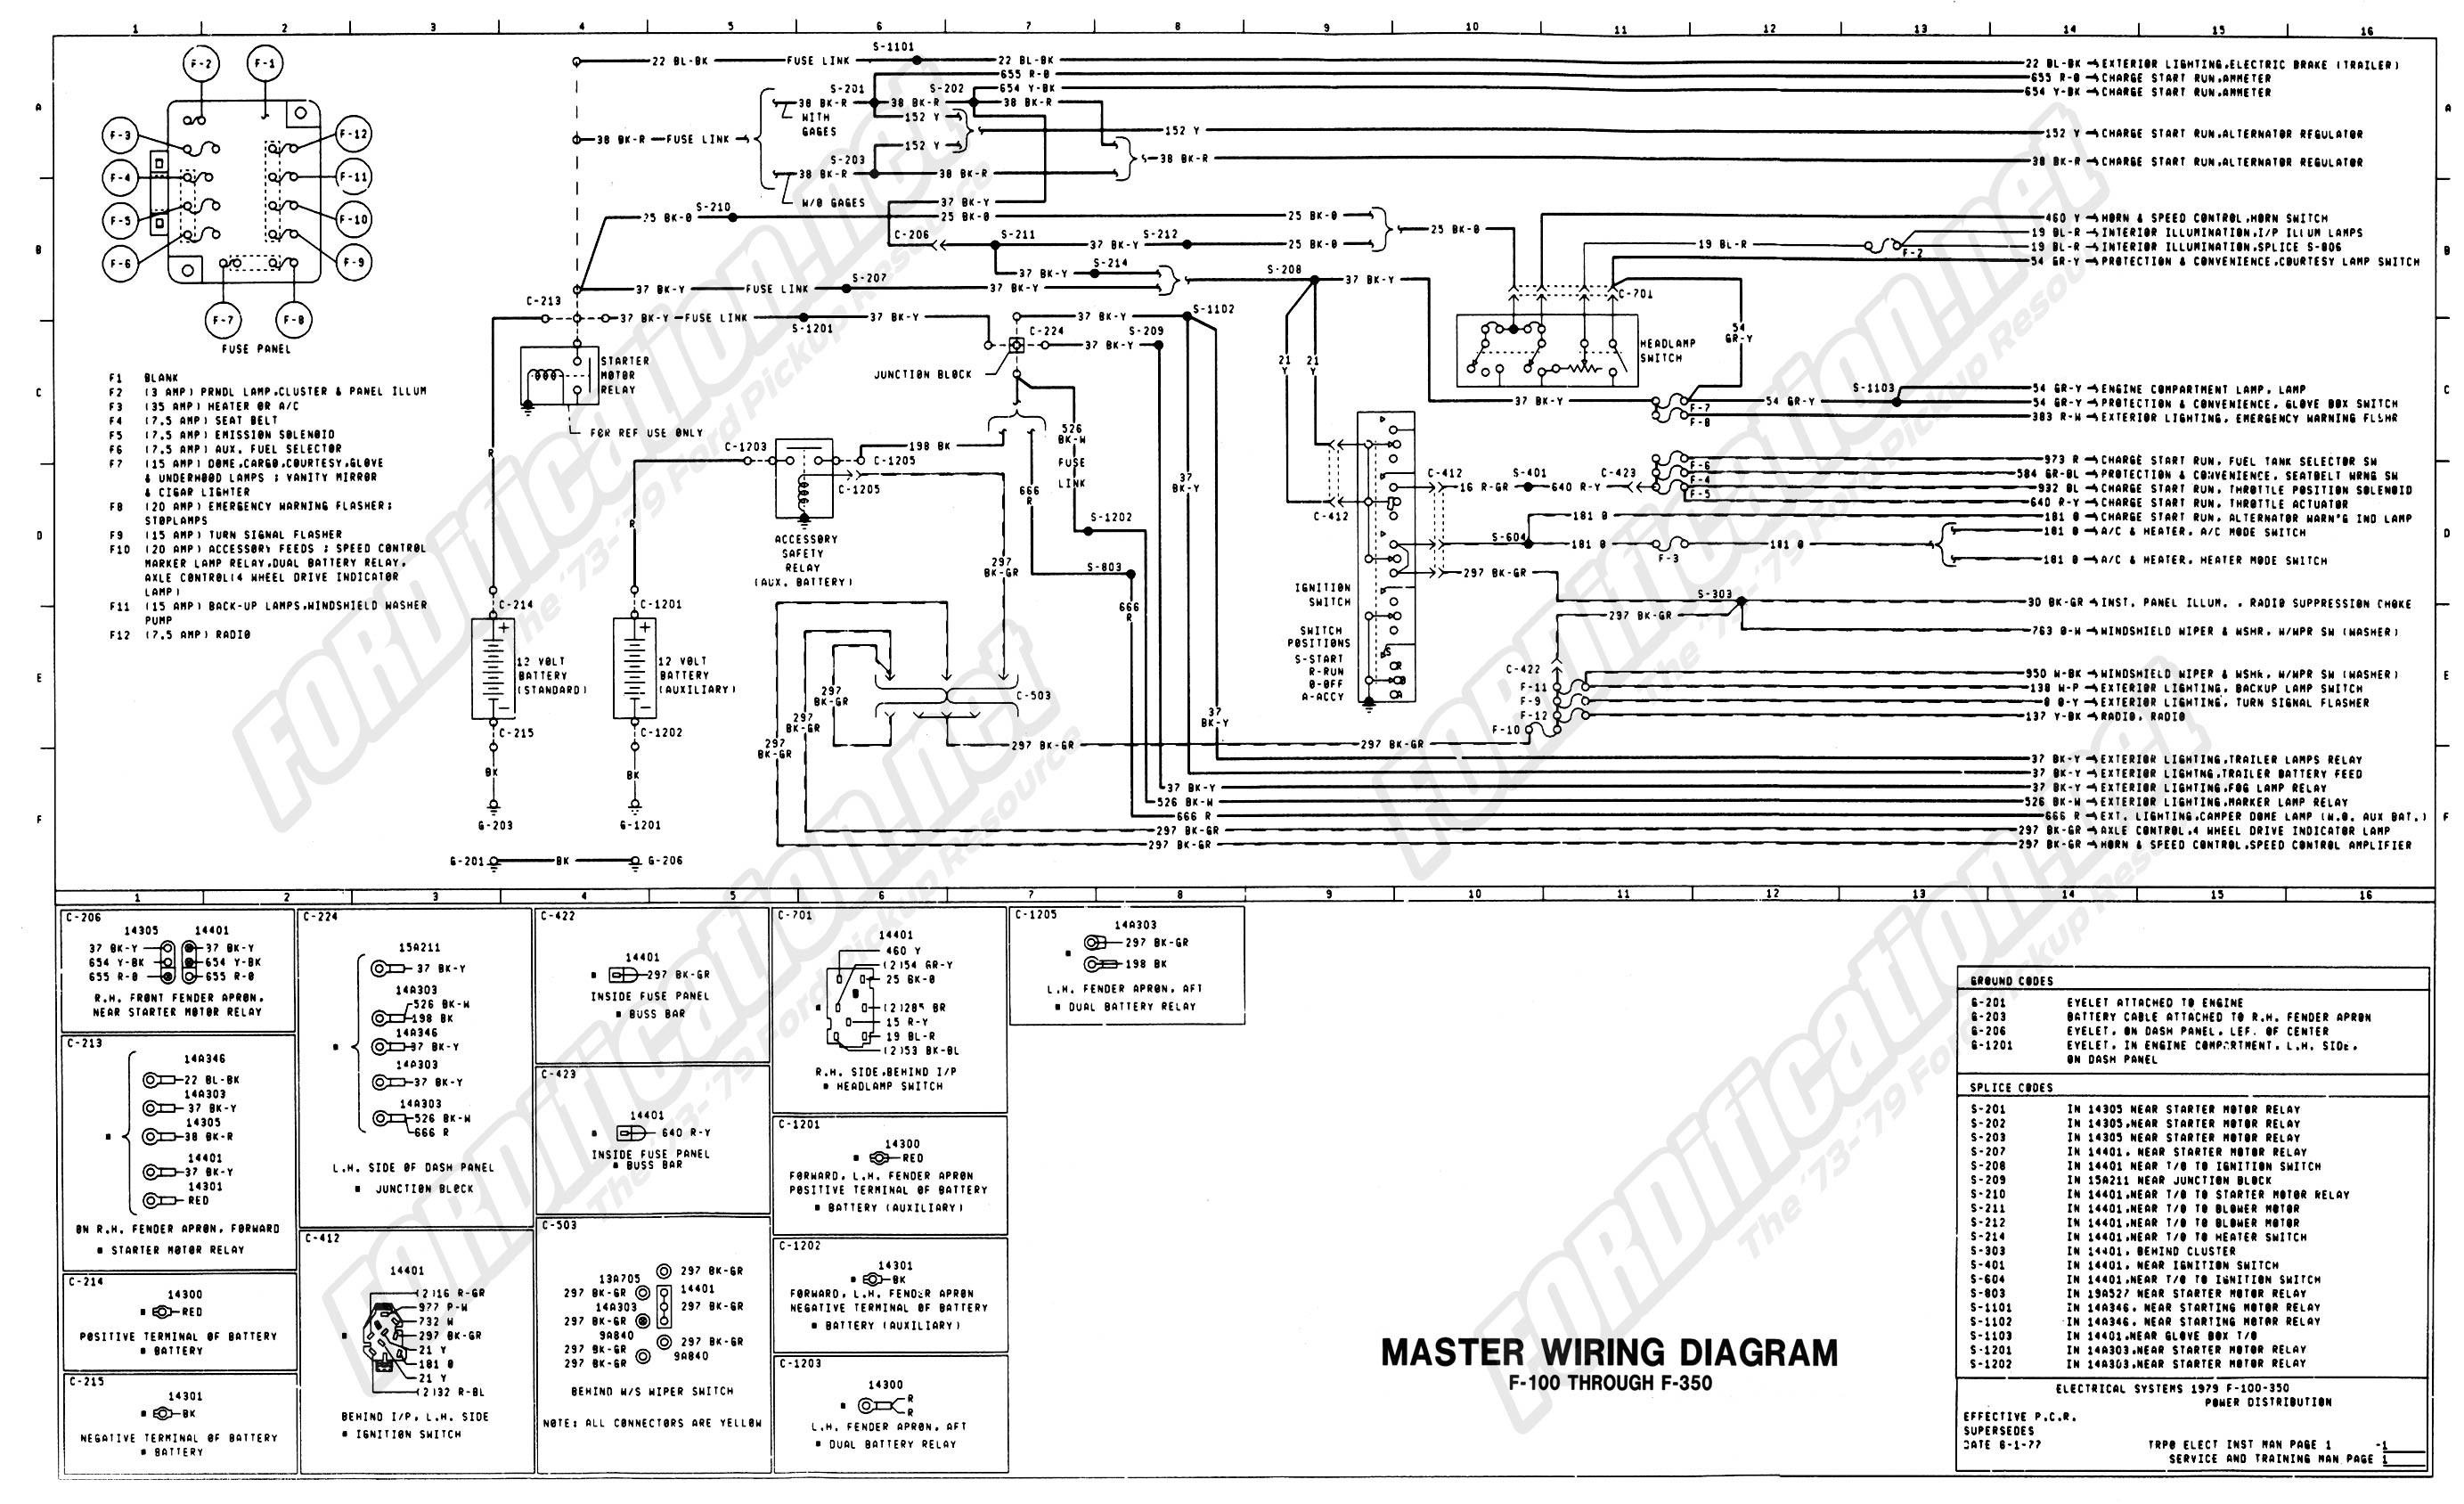 2004 ford f150 engine diagram ford charging system wiring diagram rh detoxicrecenze com Ford Truck Wiring Diagrams 1971 Ford Truck Wiring Diagram